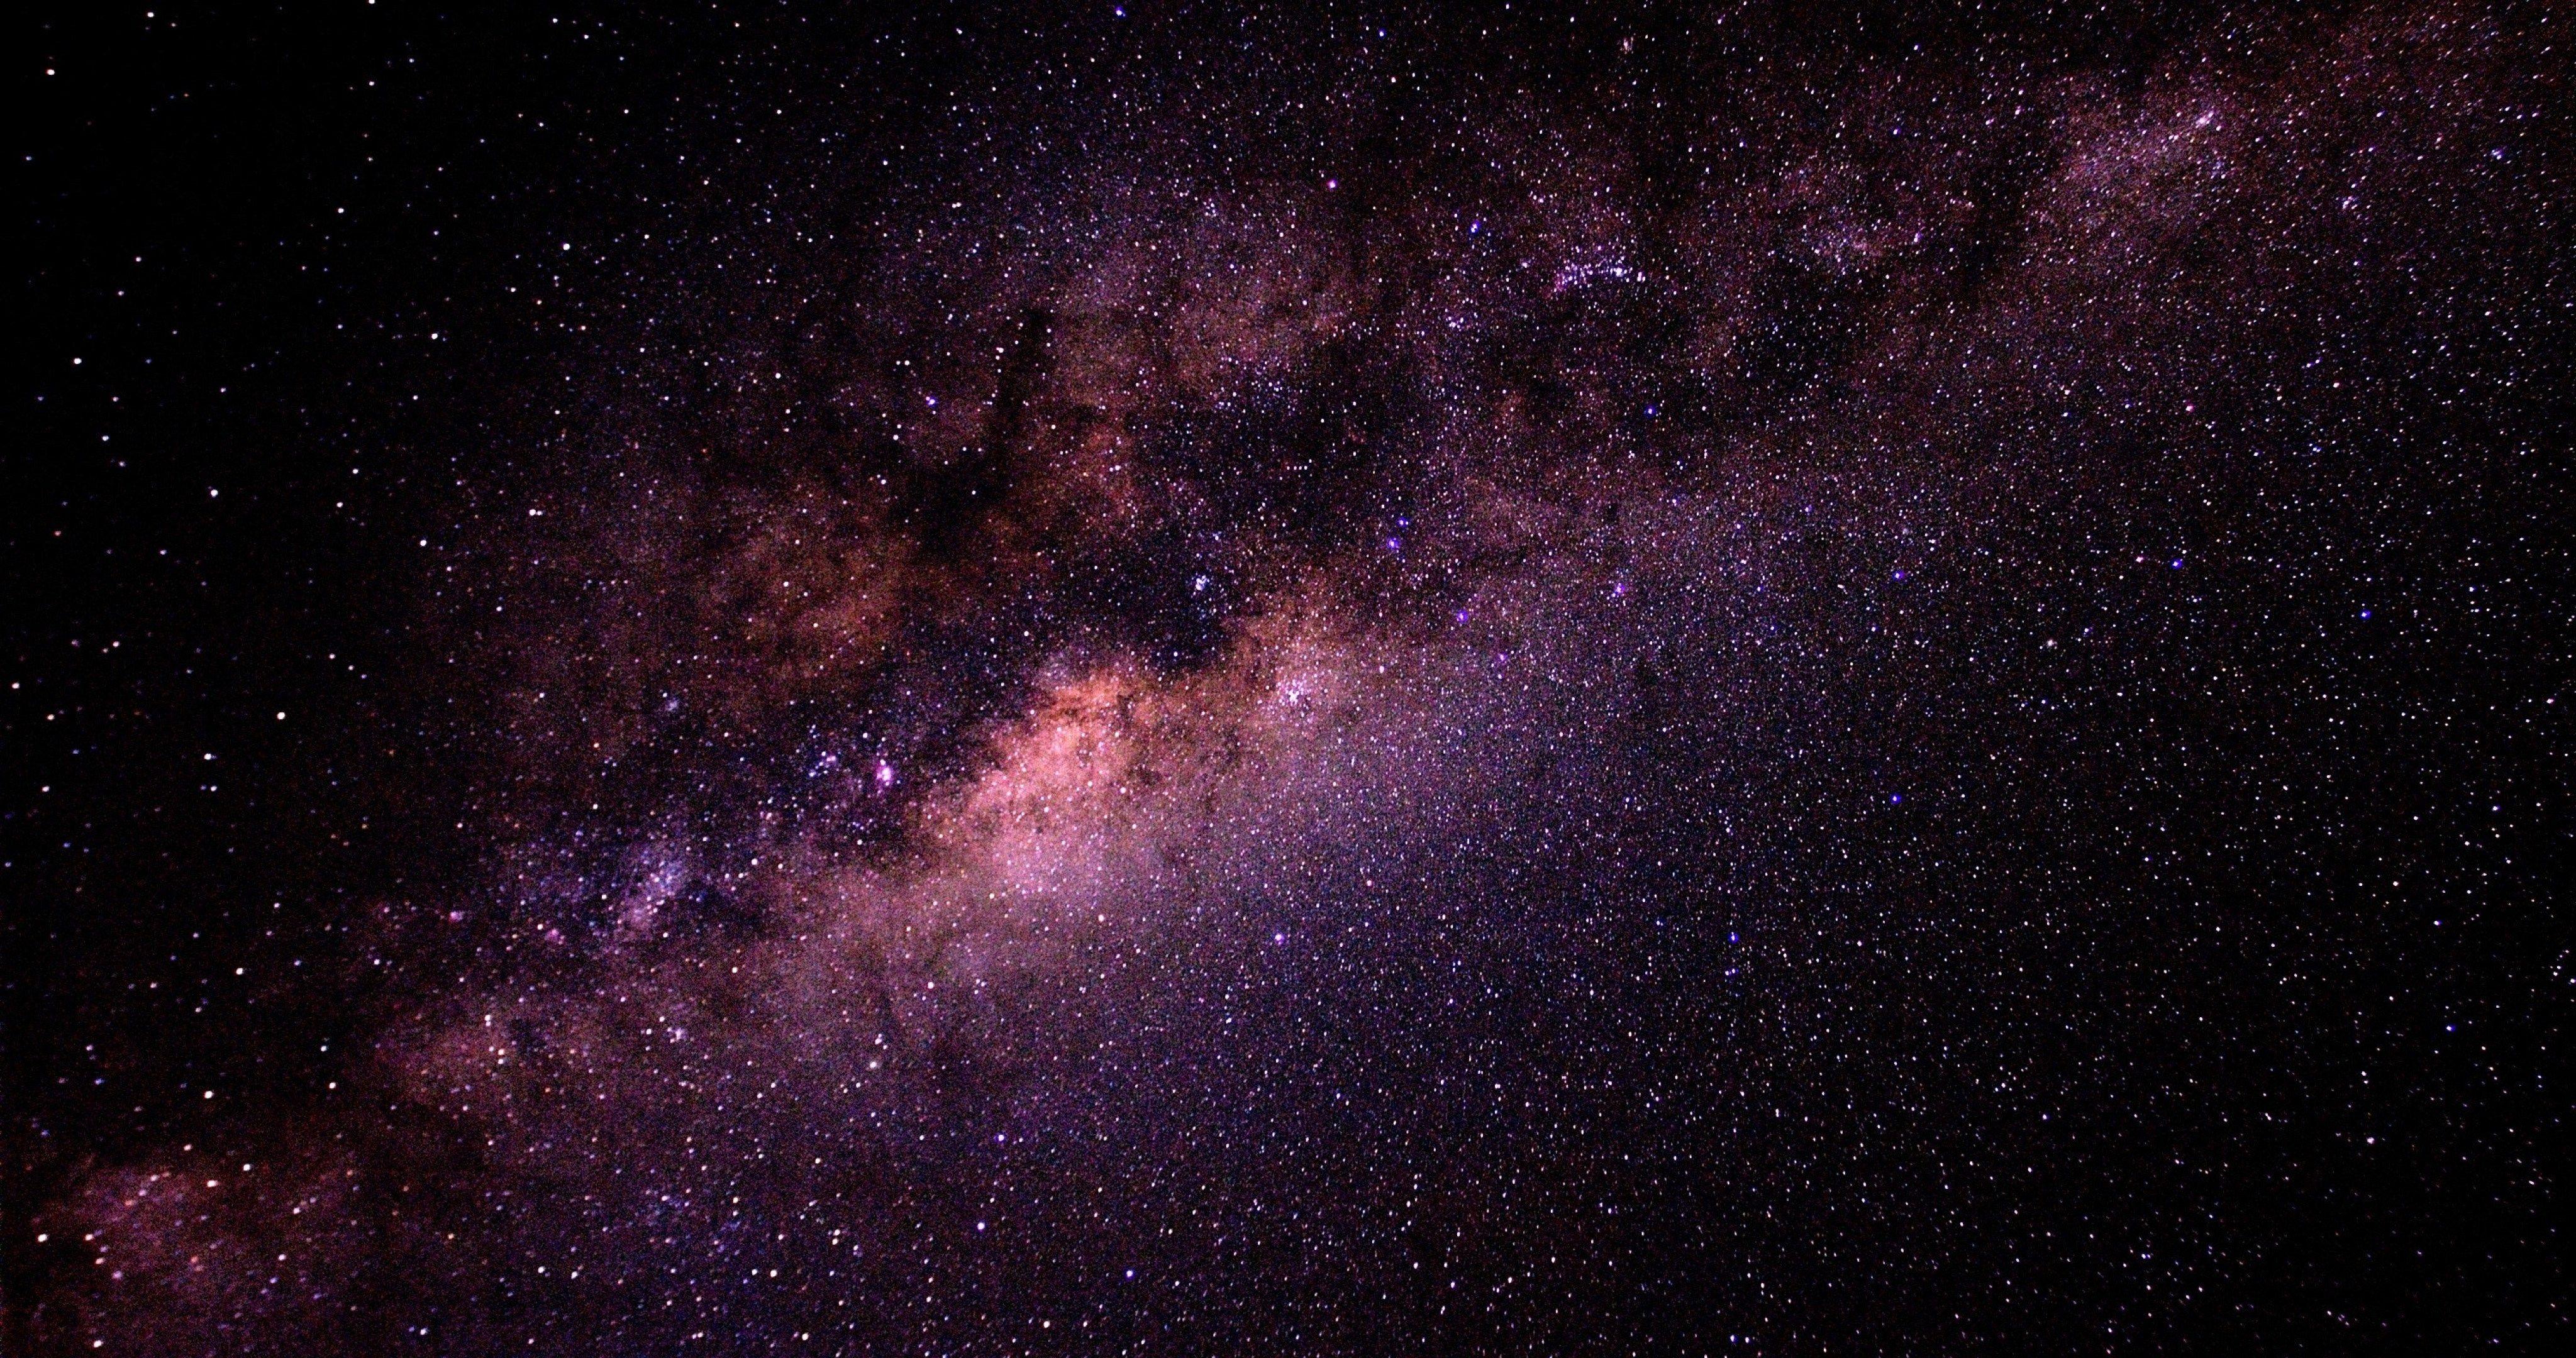 4k Galaxy Wallpaper 62 Images: Purple Galaxy 4k Ultra Hd Wallpaper